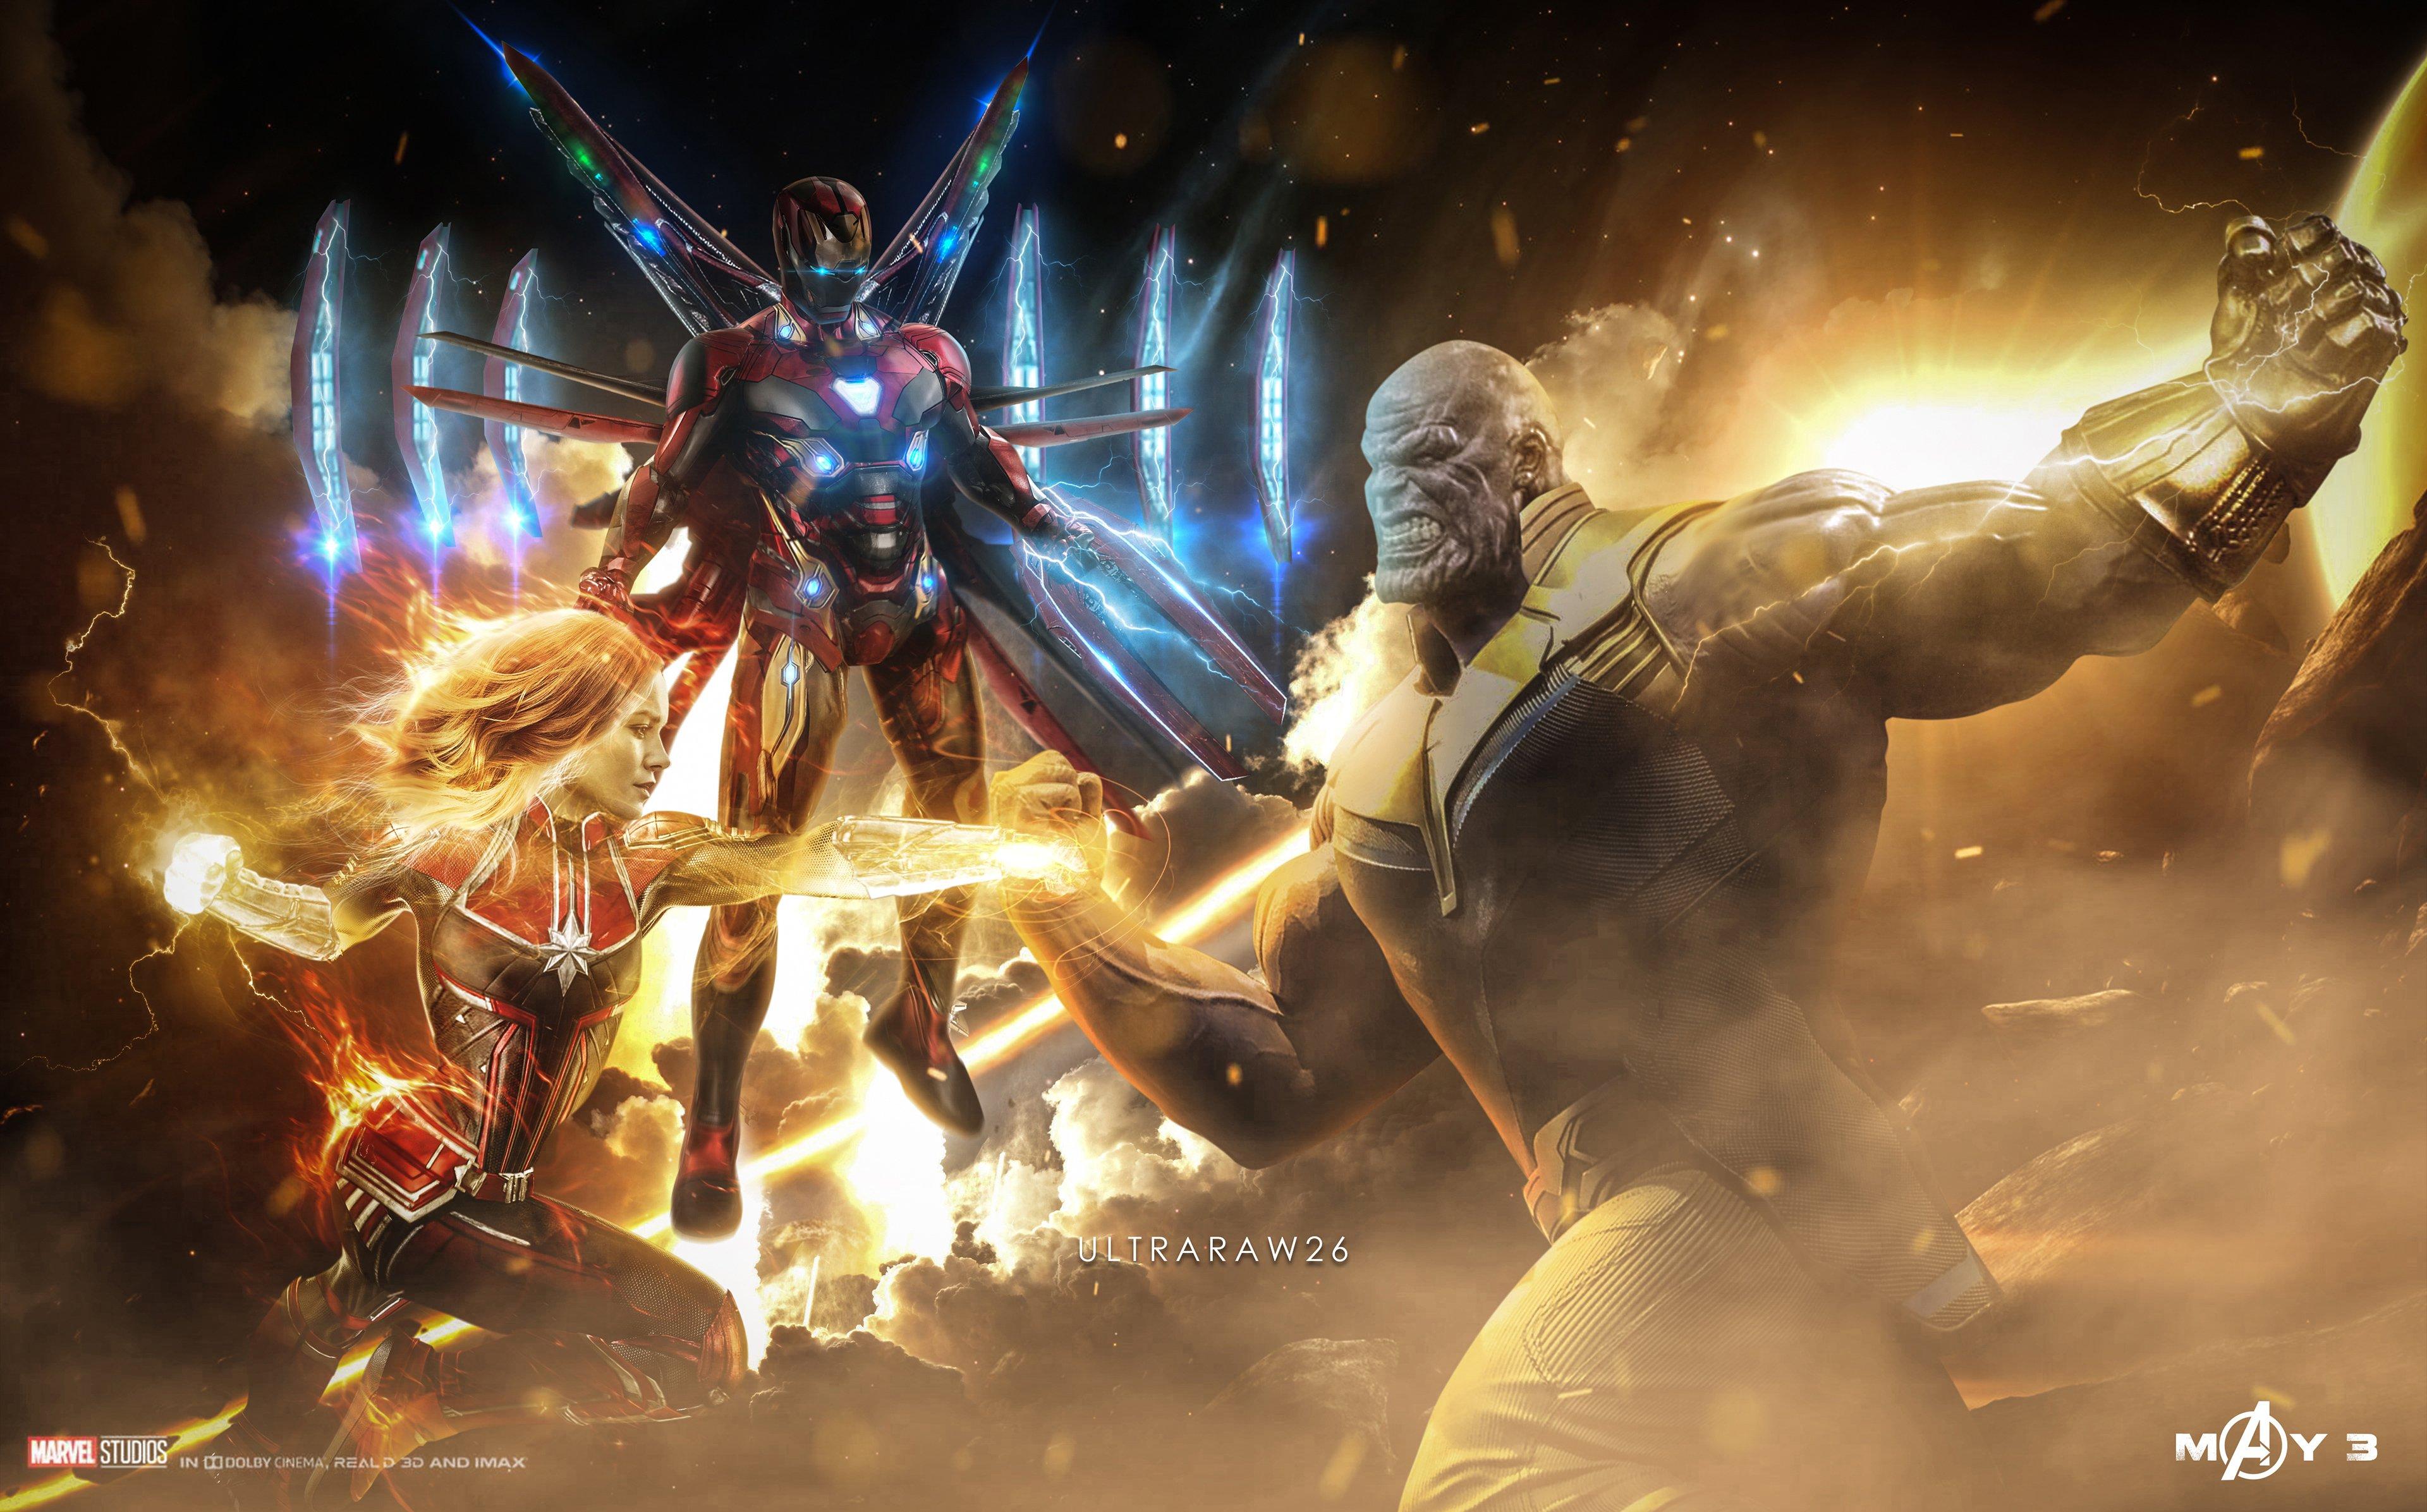 Мстители Финал, Месники 4, Танос, железный человек, капитан Марвел, обои 4к